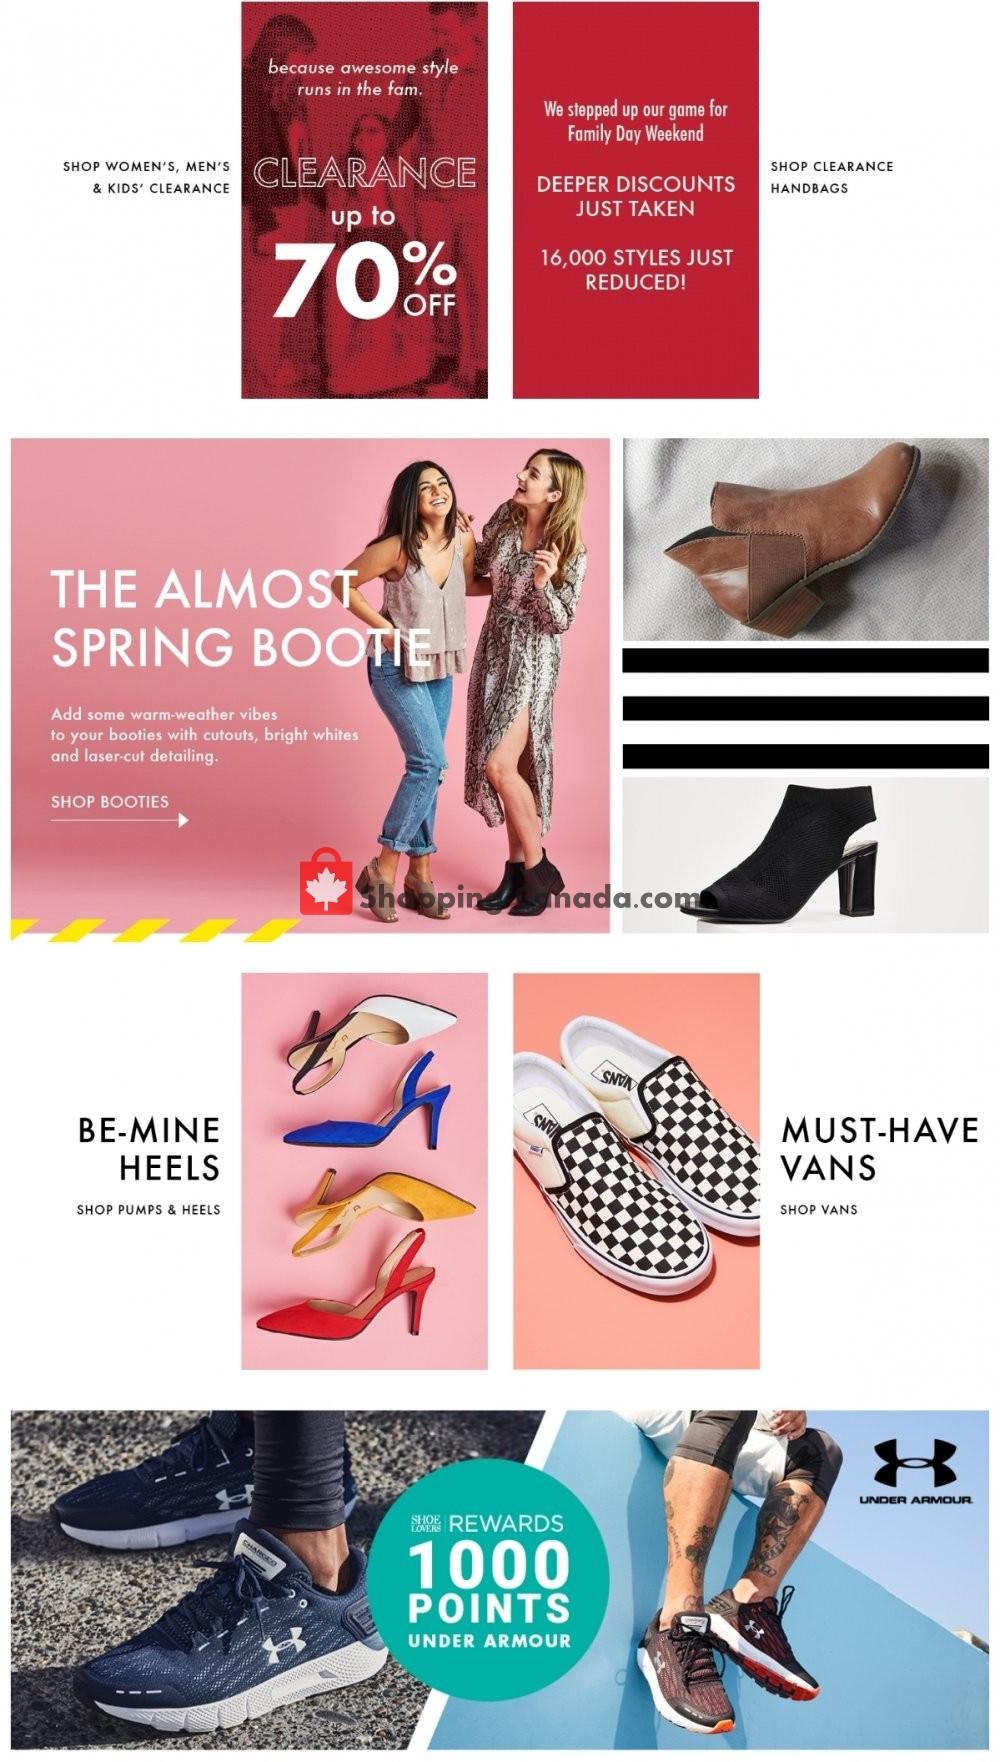 Flyer DSW Designer Shoe Warehouse Canada - from Friday February 15, 2019 to Thursday February 21, 2019